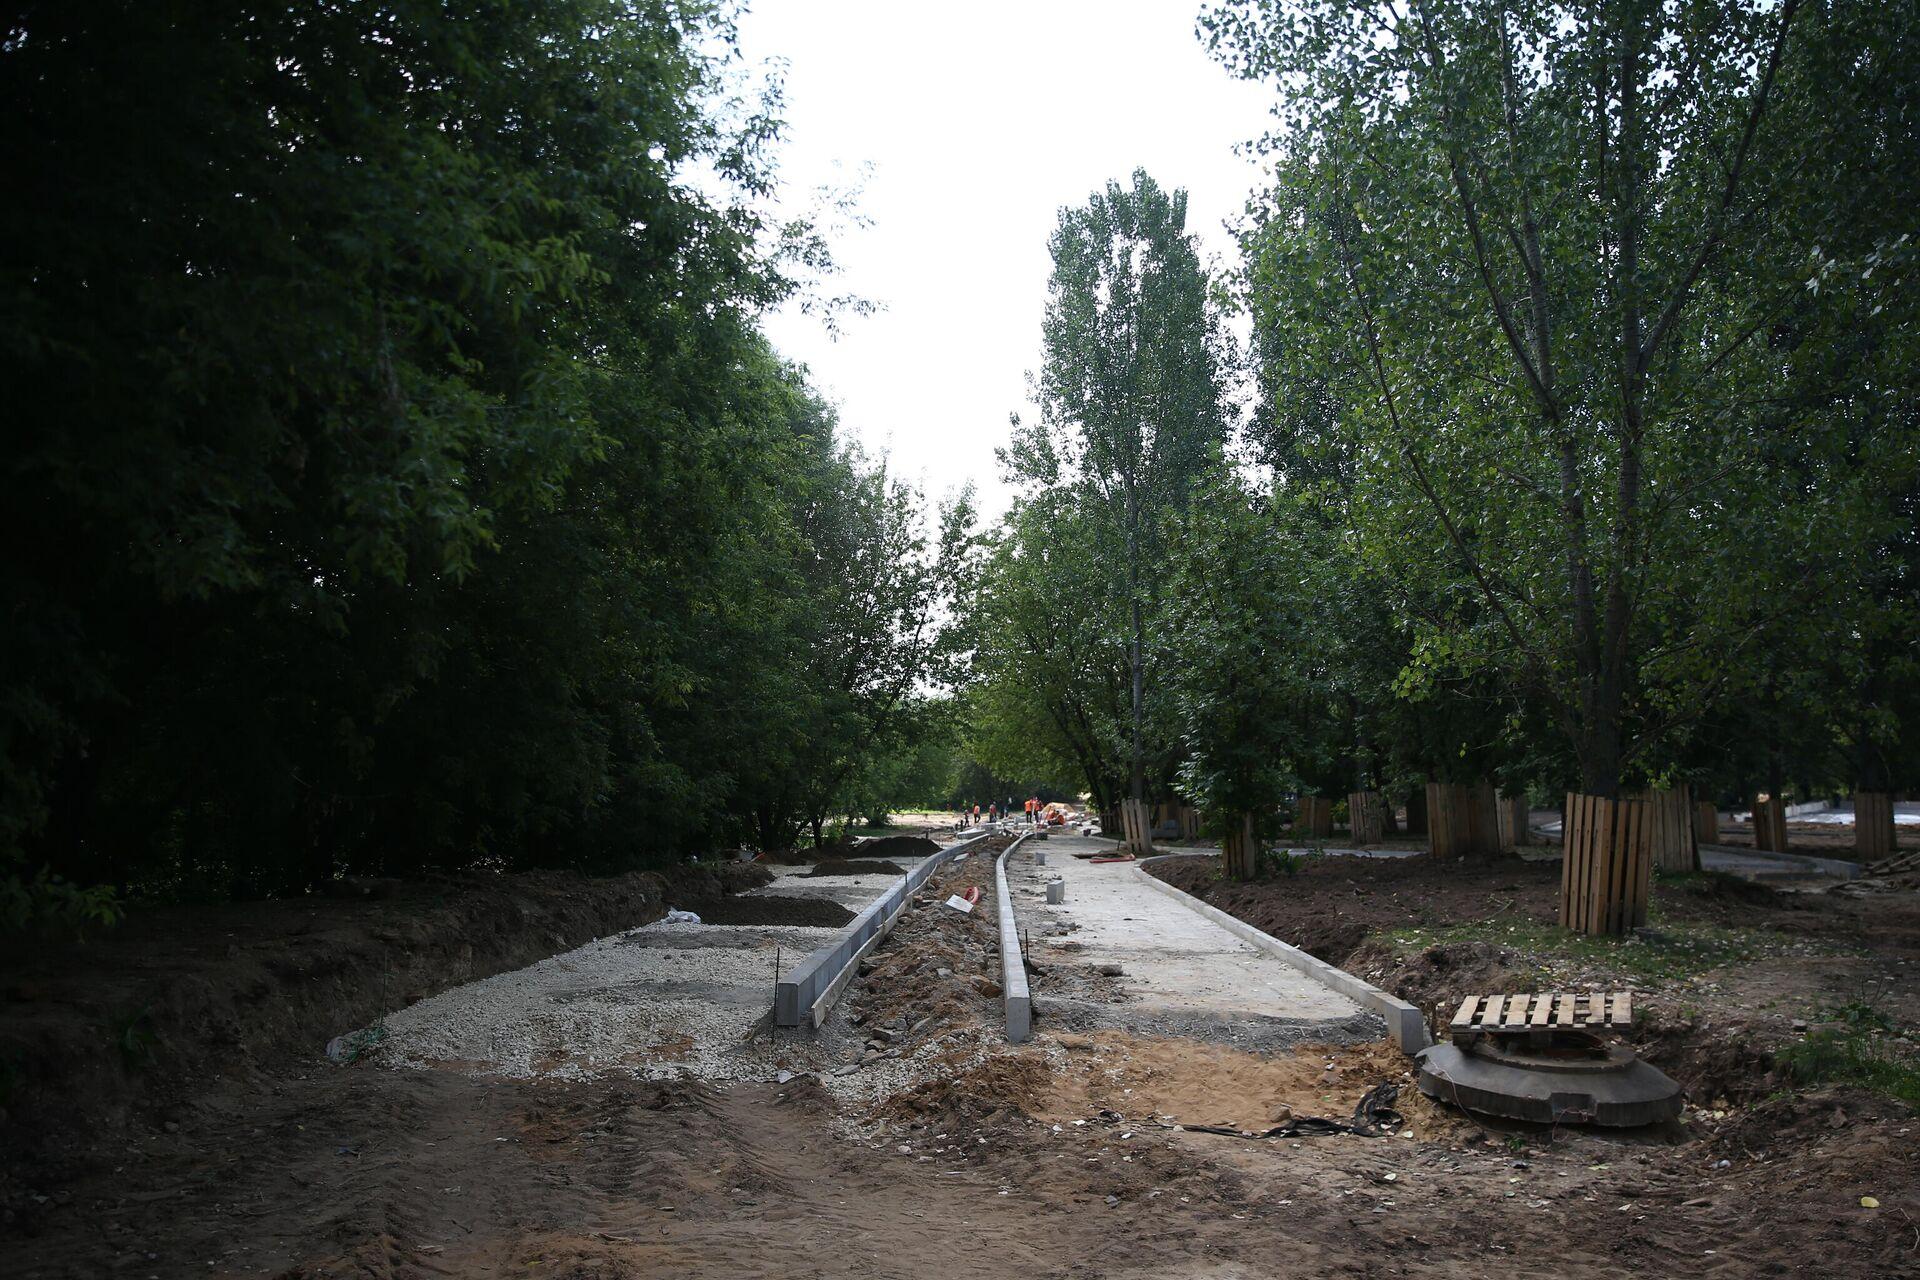 Работы по благоустройству парка Яуза в Москве - РИА Новости, 1920, 22.07.2021